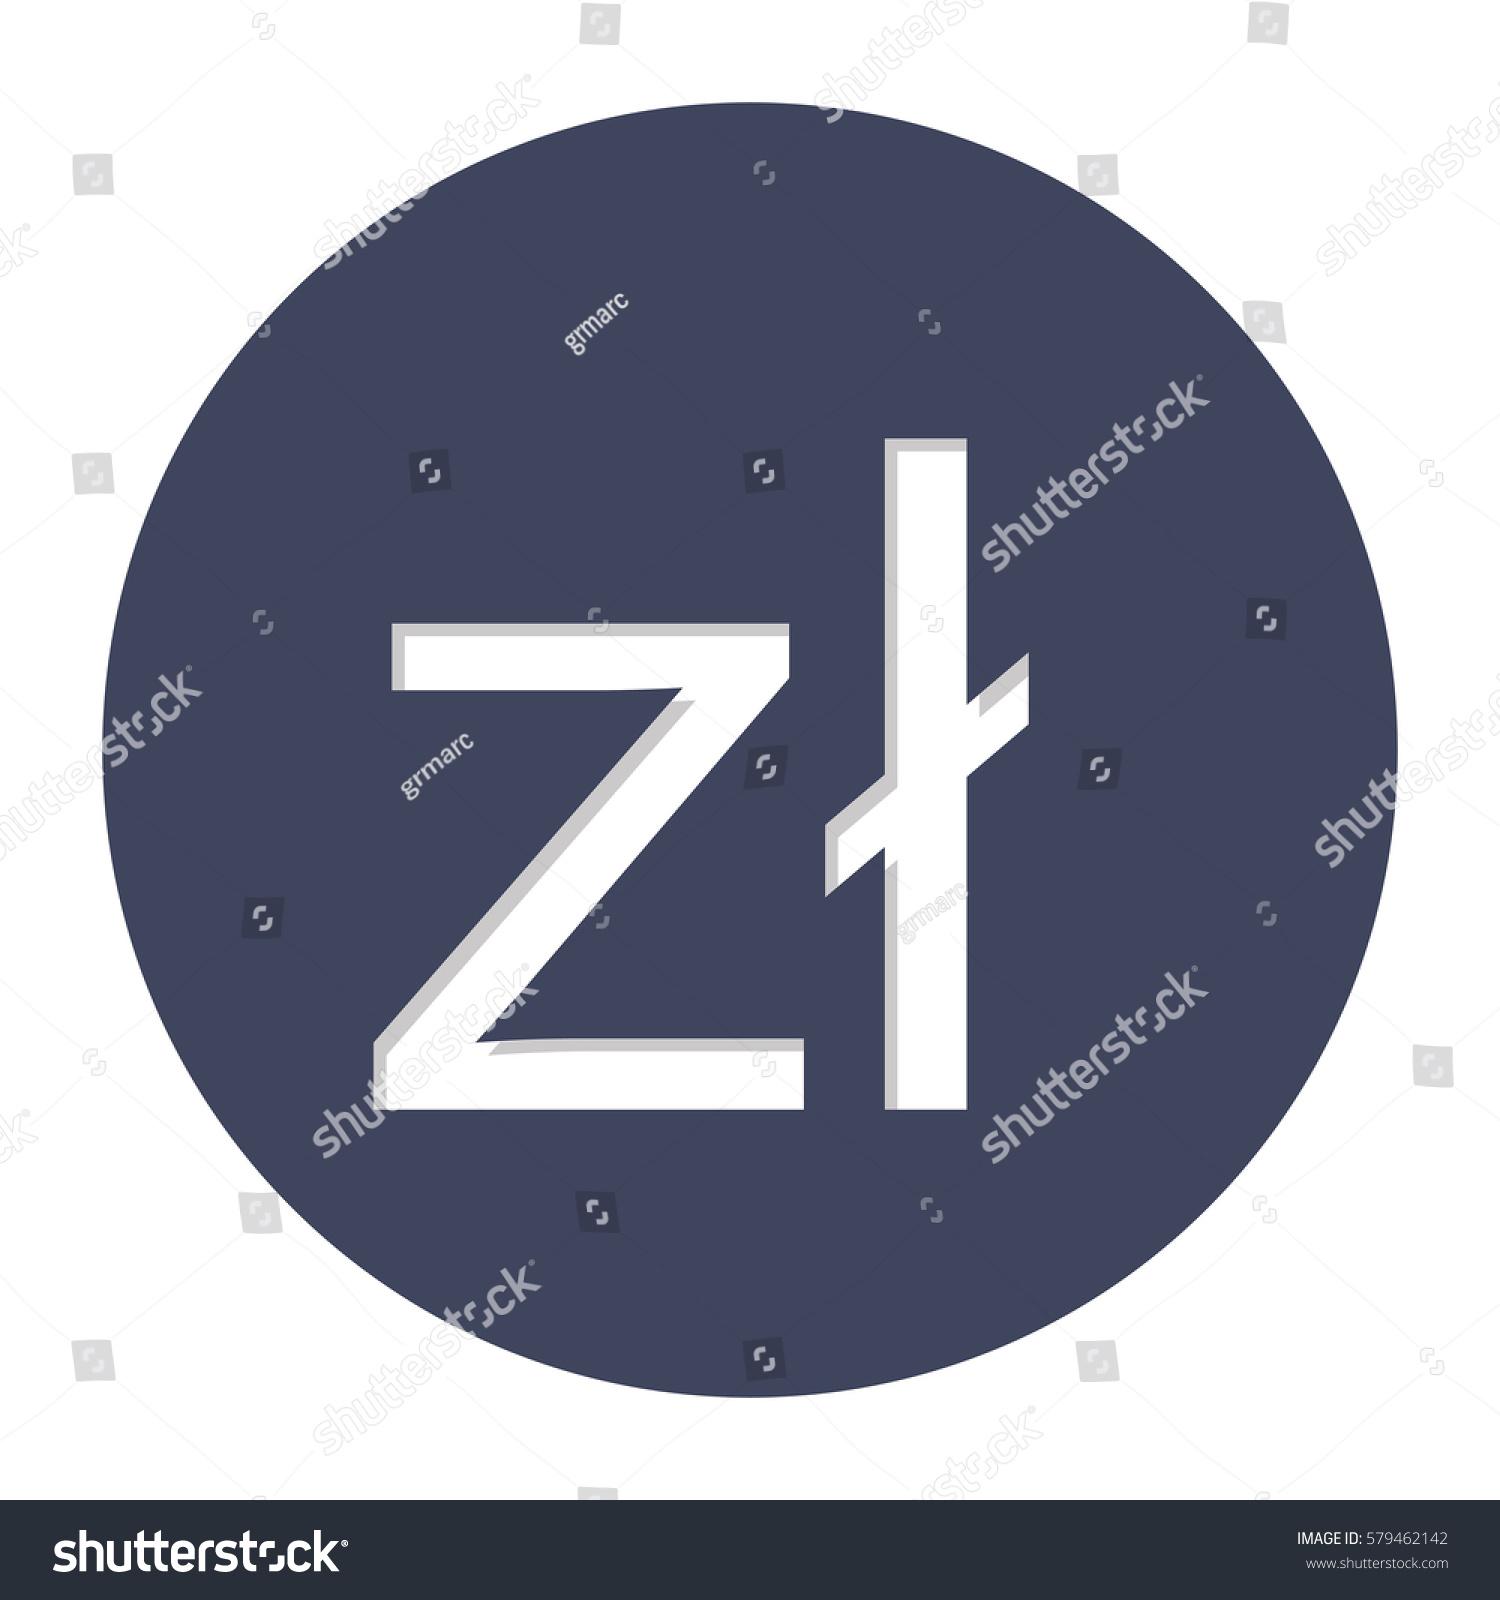 Polish zloty currency symbol icon image stock vector 579462142 polish zloty currency symbol icon image vector illustration buycottarizona Gallery